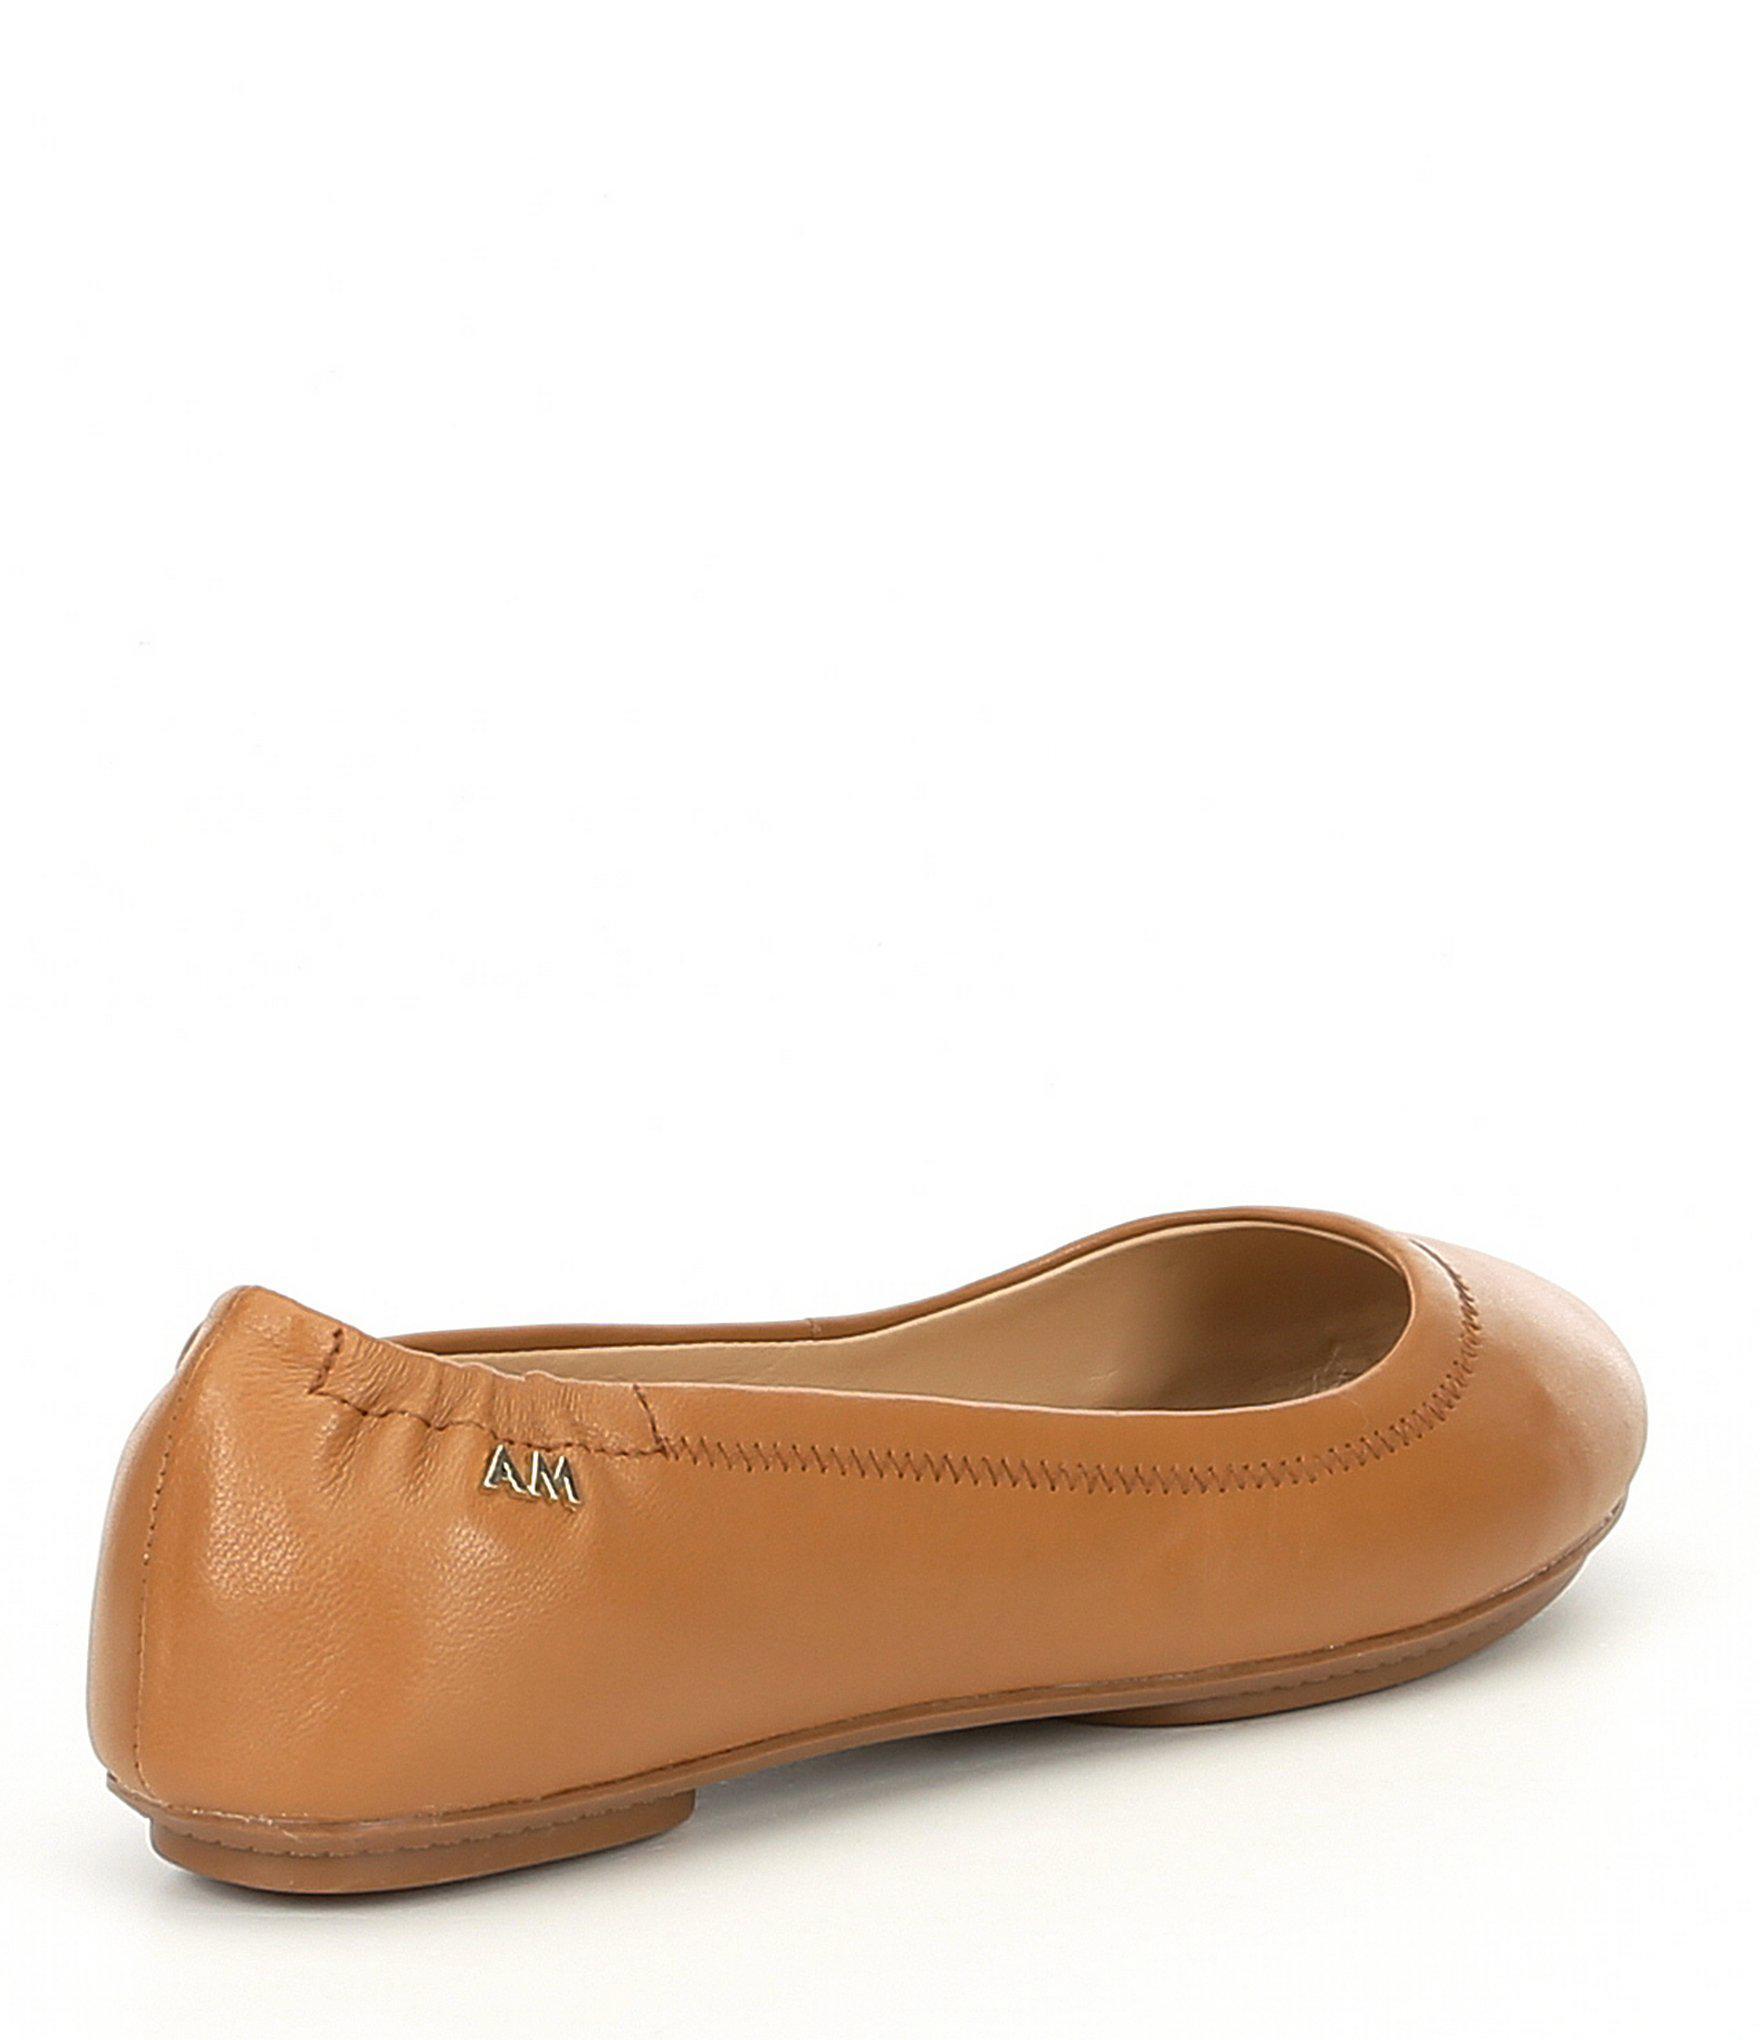 c1fb6304ff0 Lyst - Antonio Melani Frederica Leather Round Toe Flats in Brown